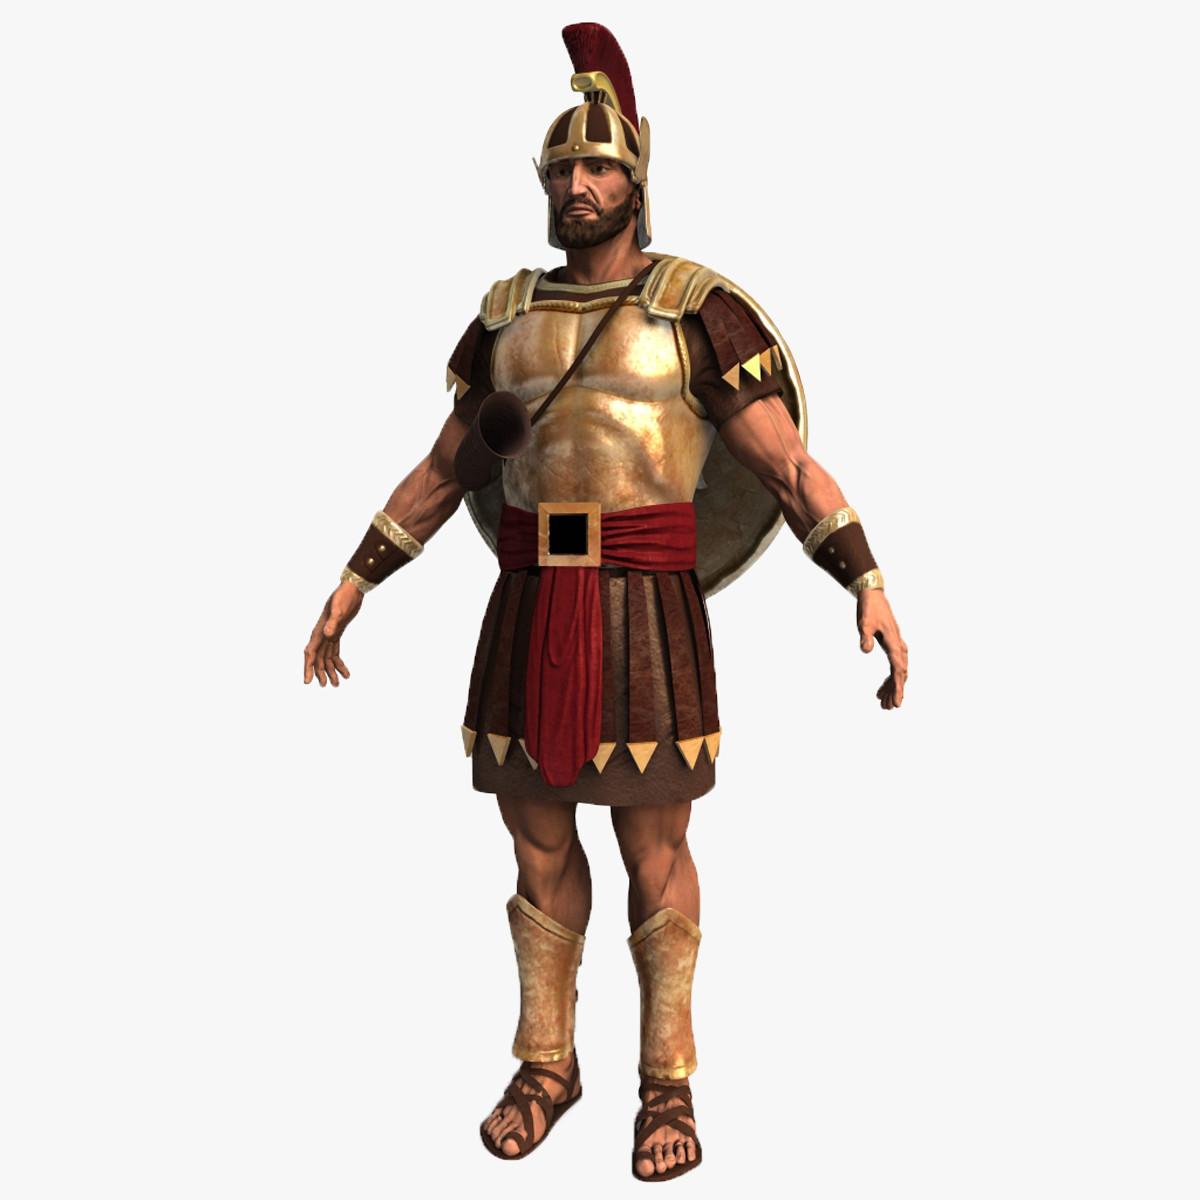 3d model of roman soldier.